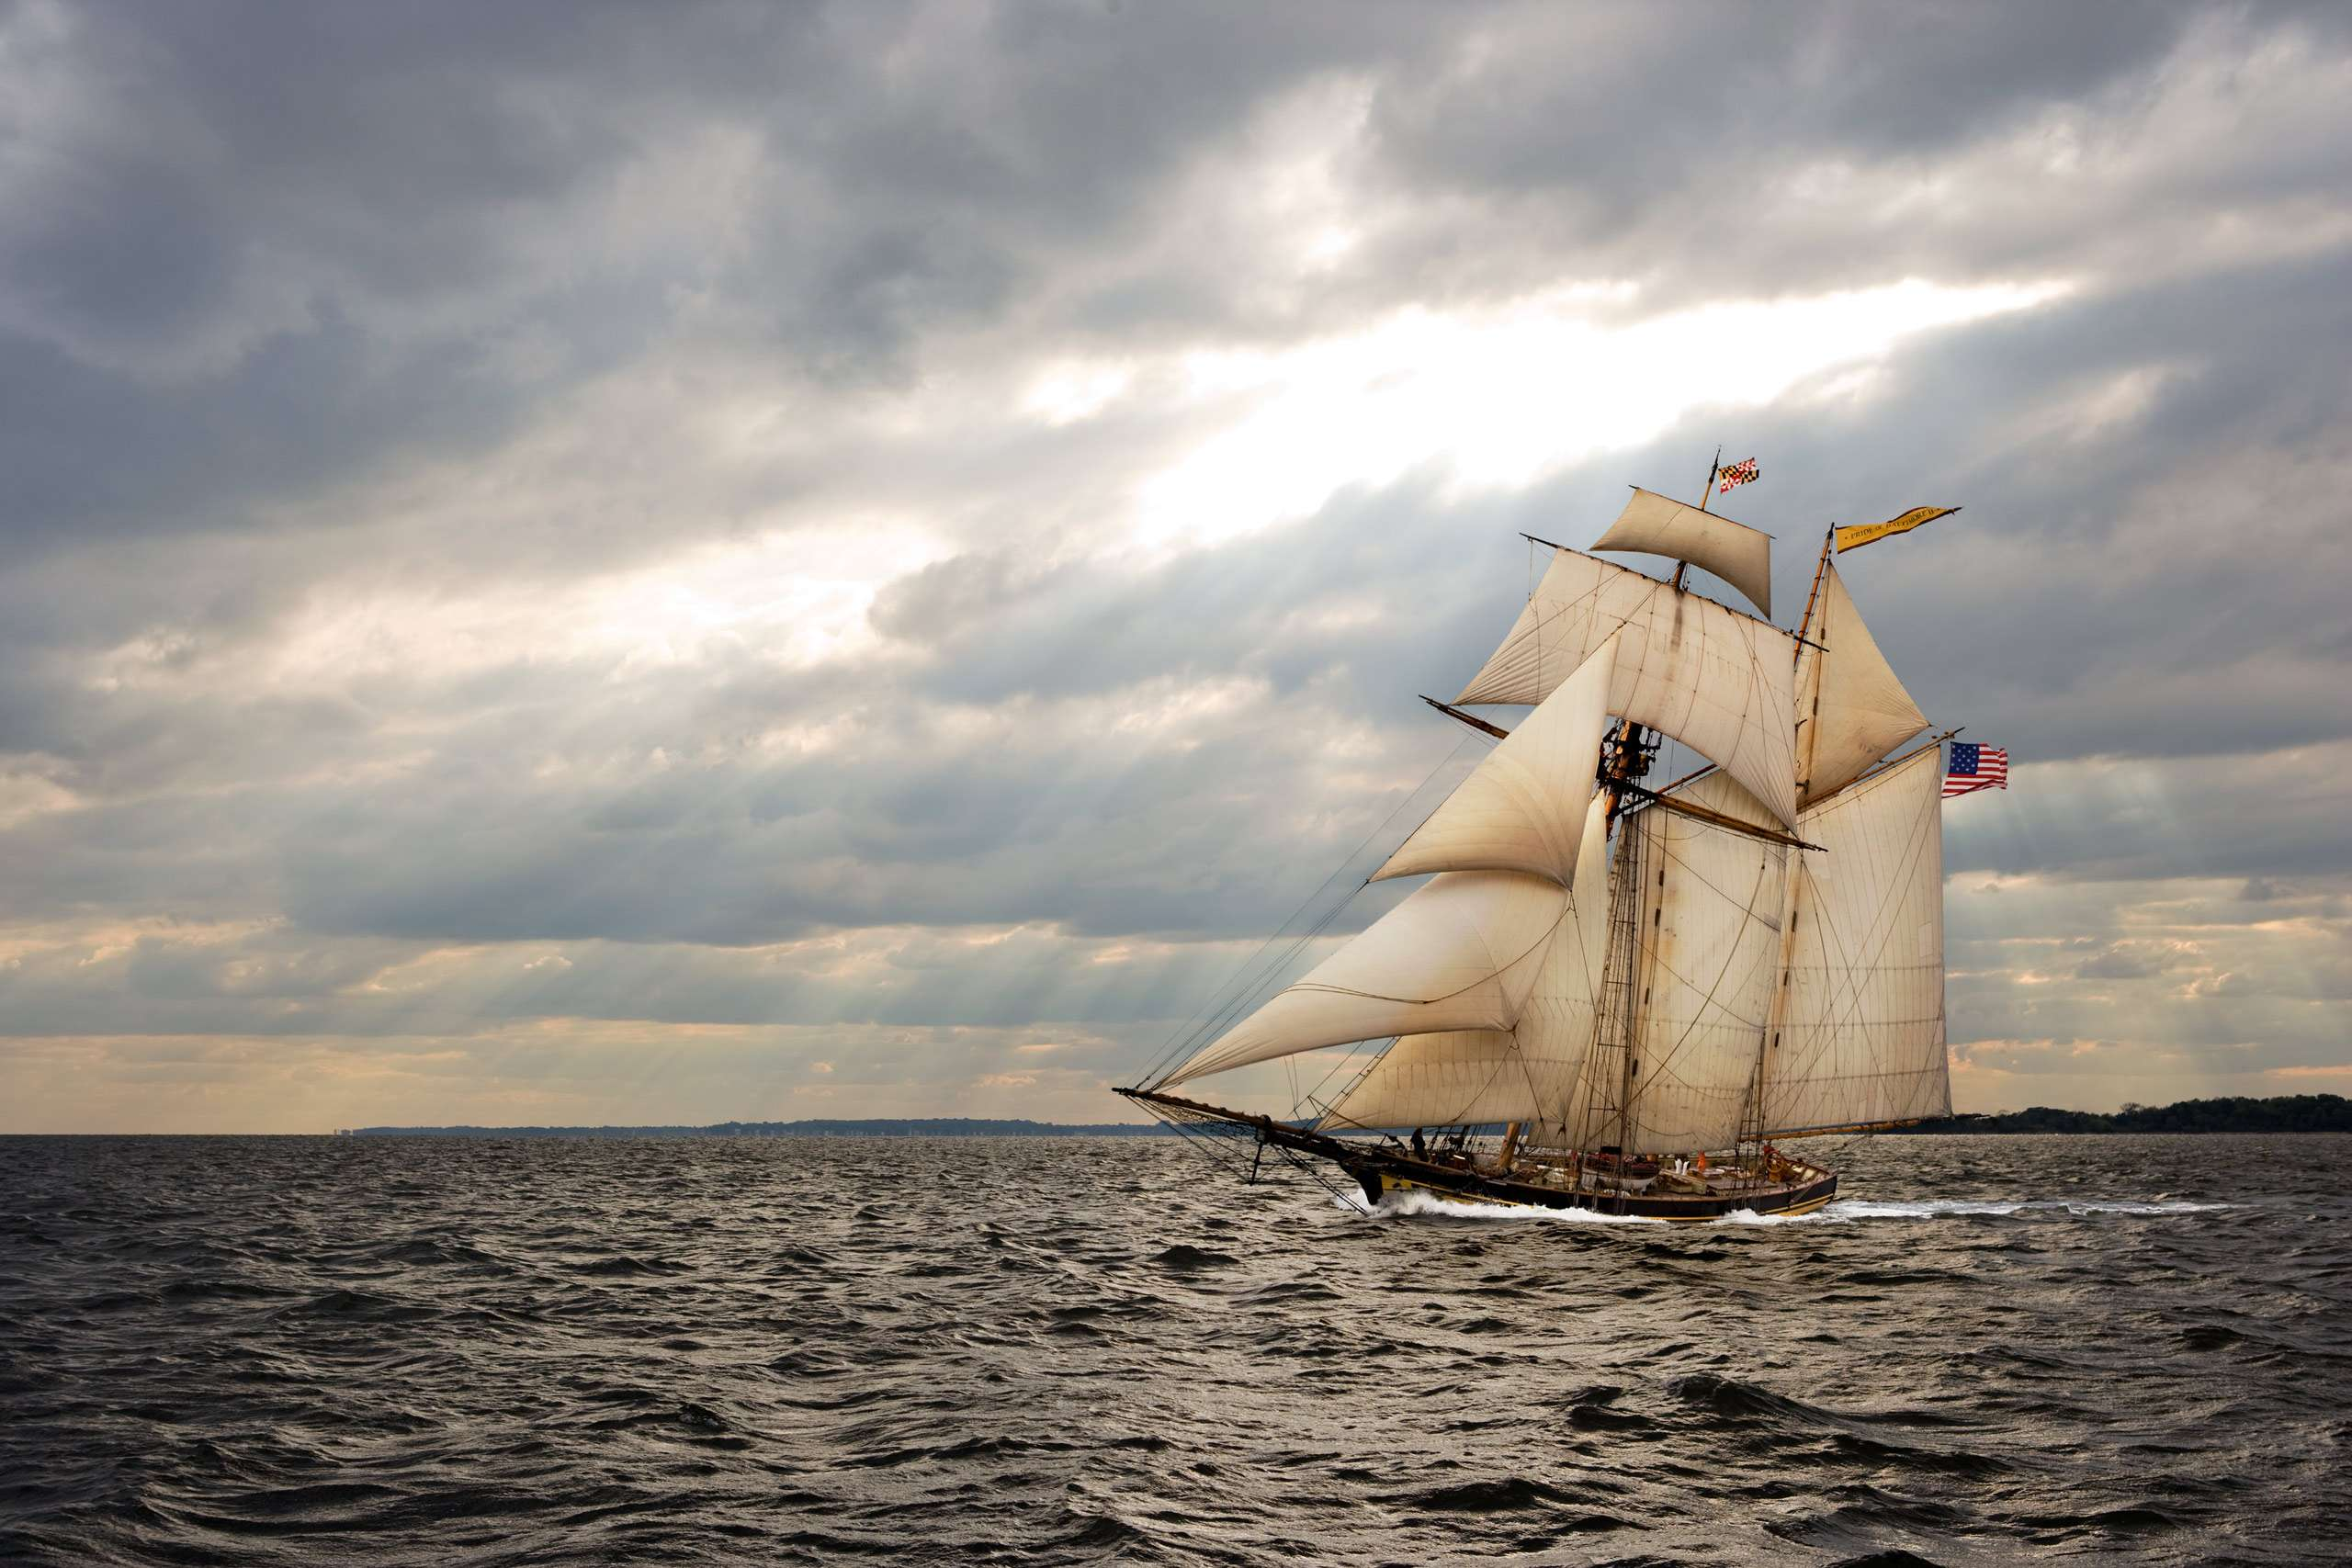 PORTFOLIO - Sailing - Tall Ships #14-PCG320